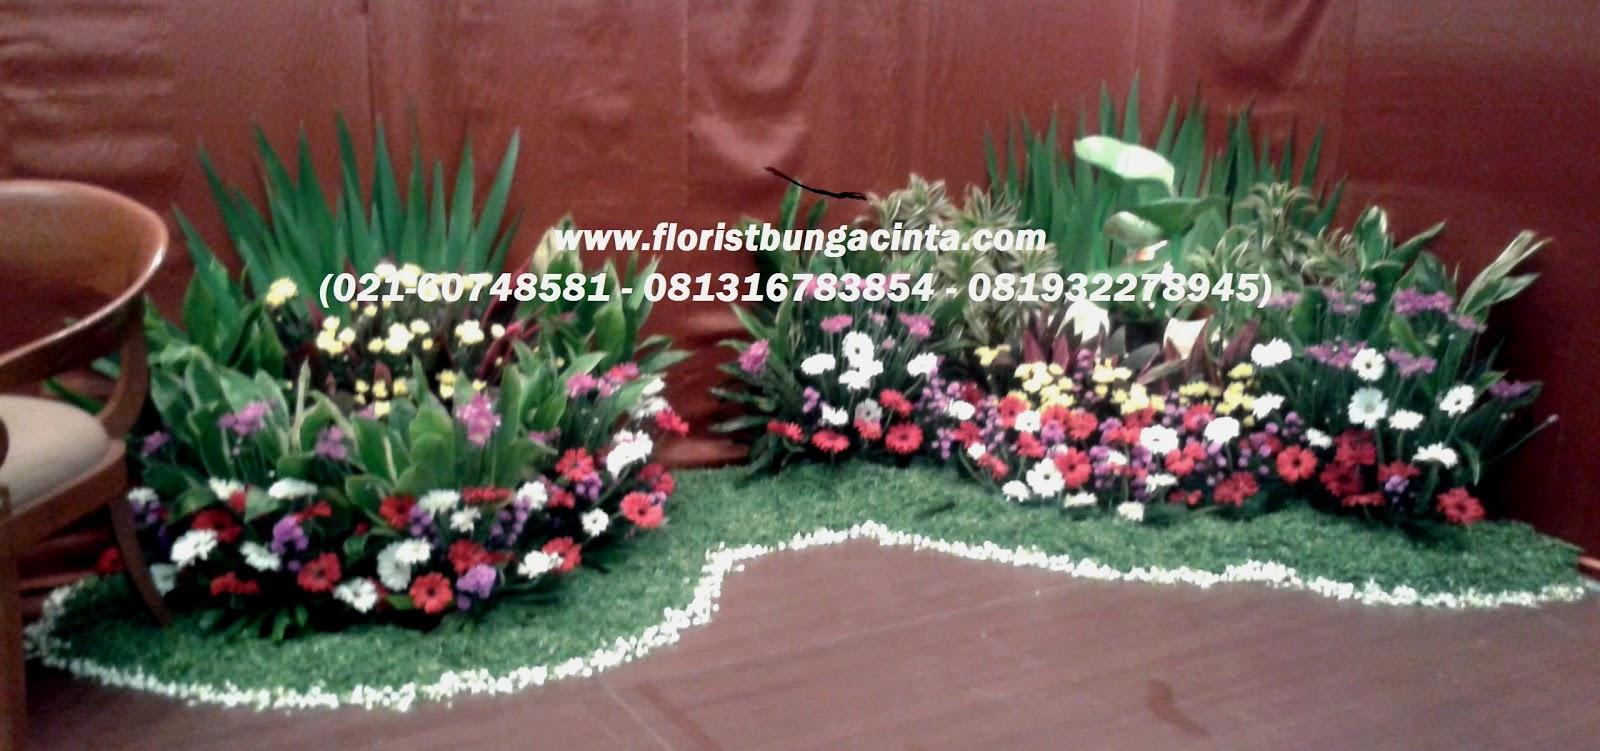 Rusty Florist Jakarta Online Flower Shop Dekorasi Mini Garden